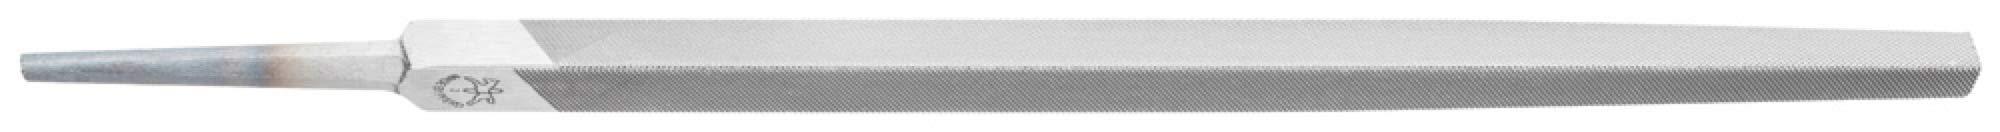 PFERD 11101 8'' Three Square File Second Cut (10pk)